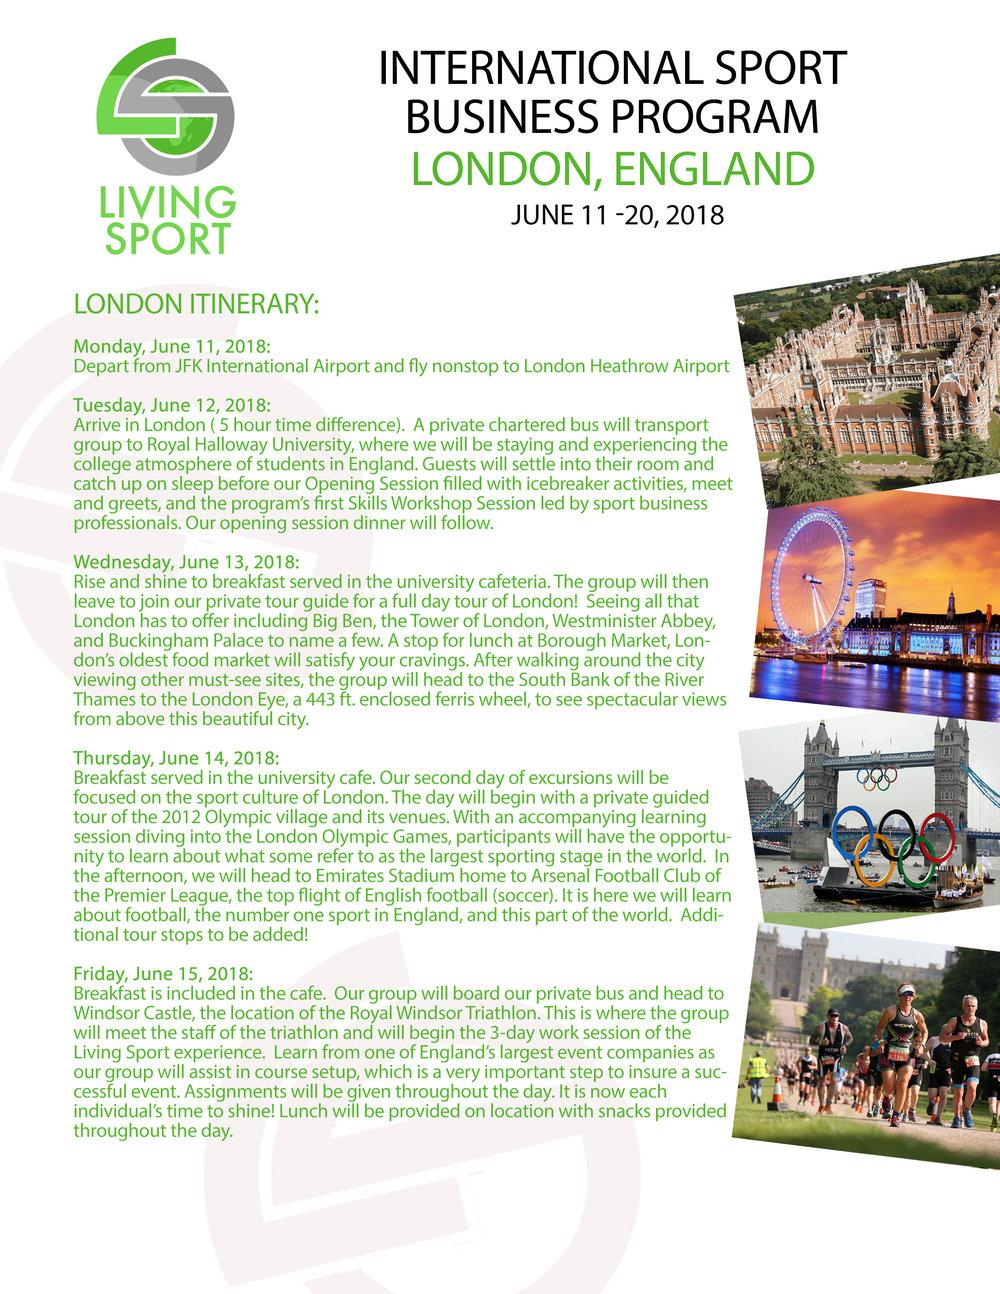 Living Sport Itinerary - London 2018.jpg